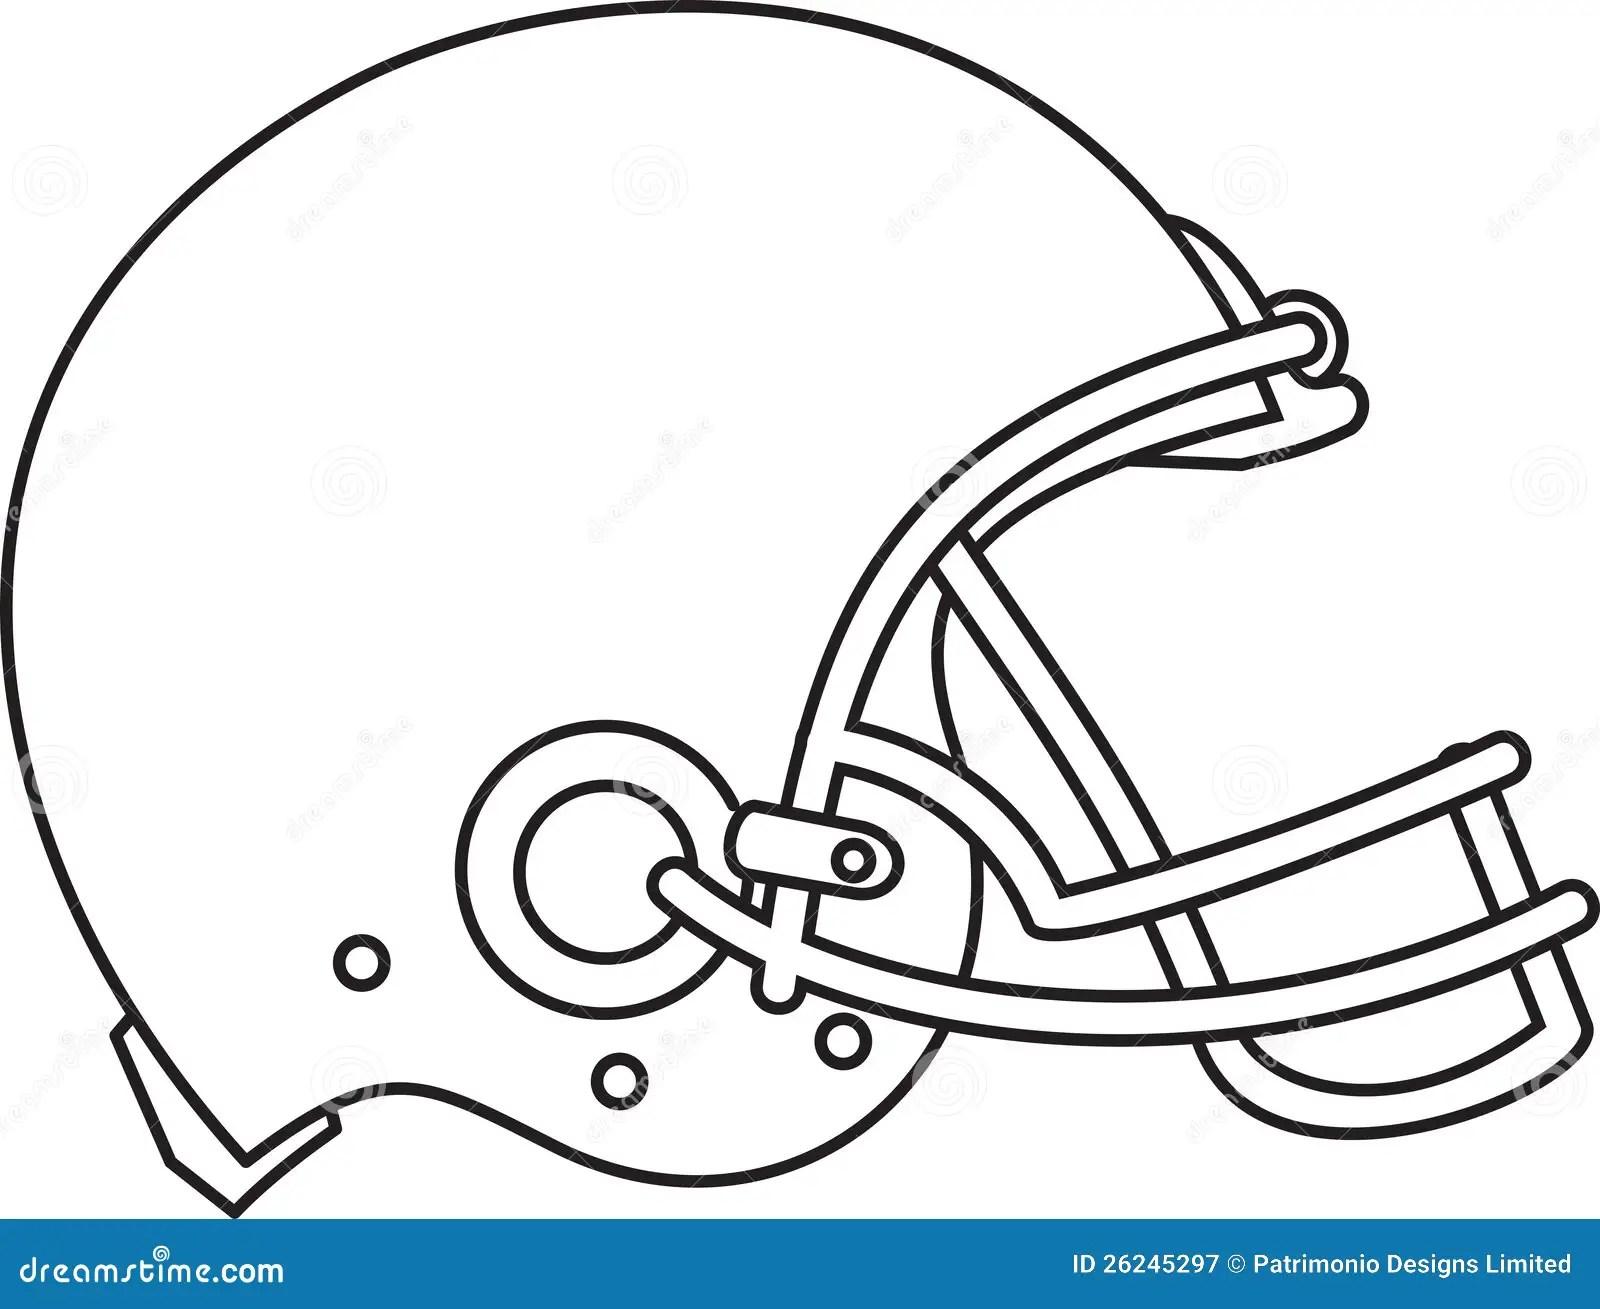 American Football Helmet Line Drawing Royalty Free Stock